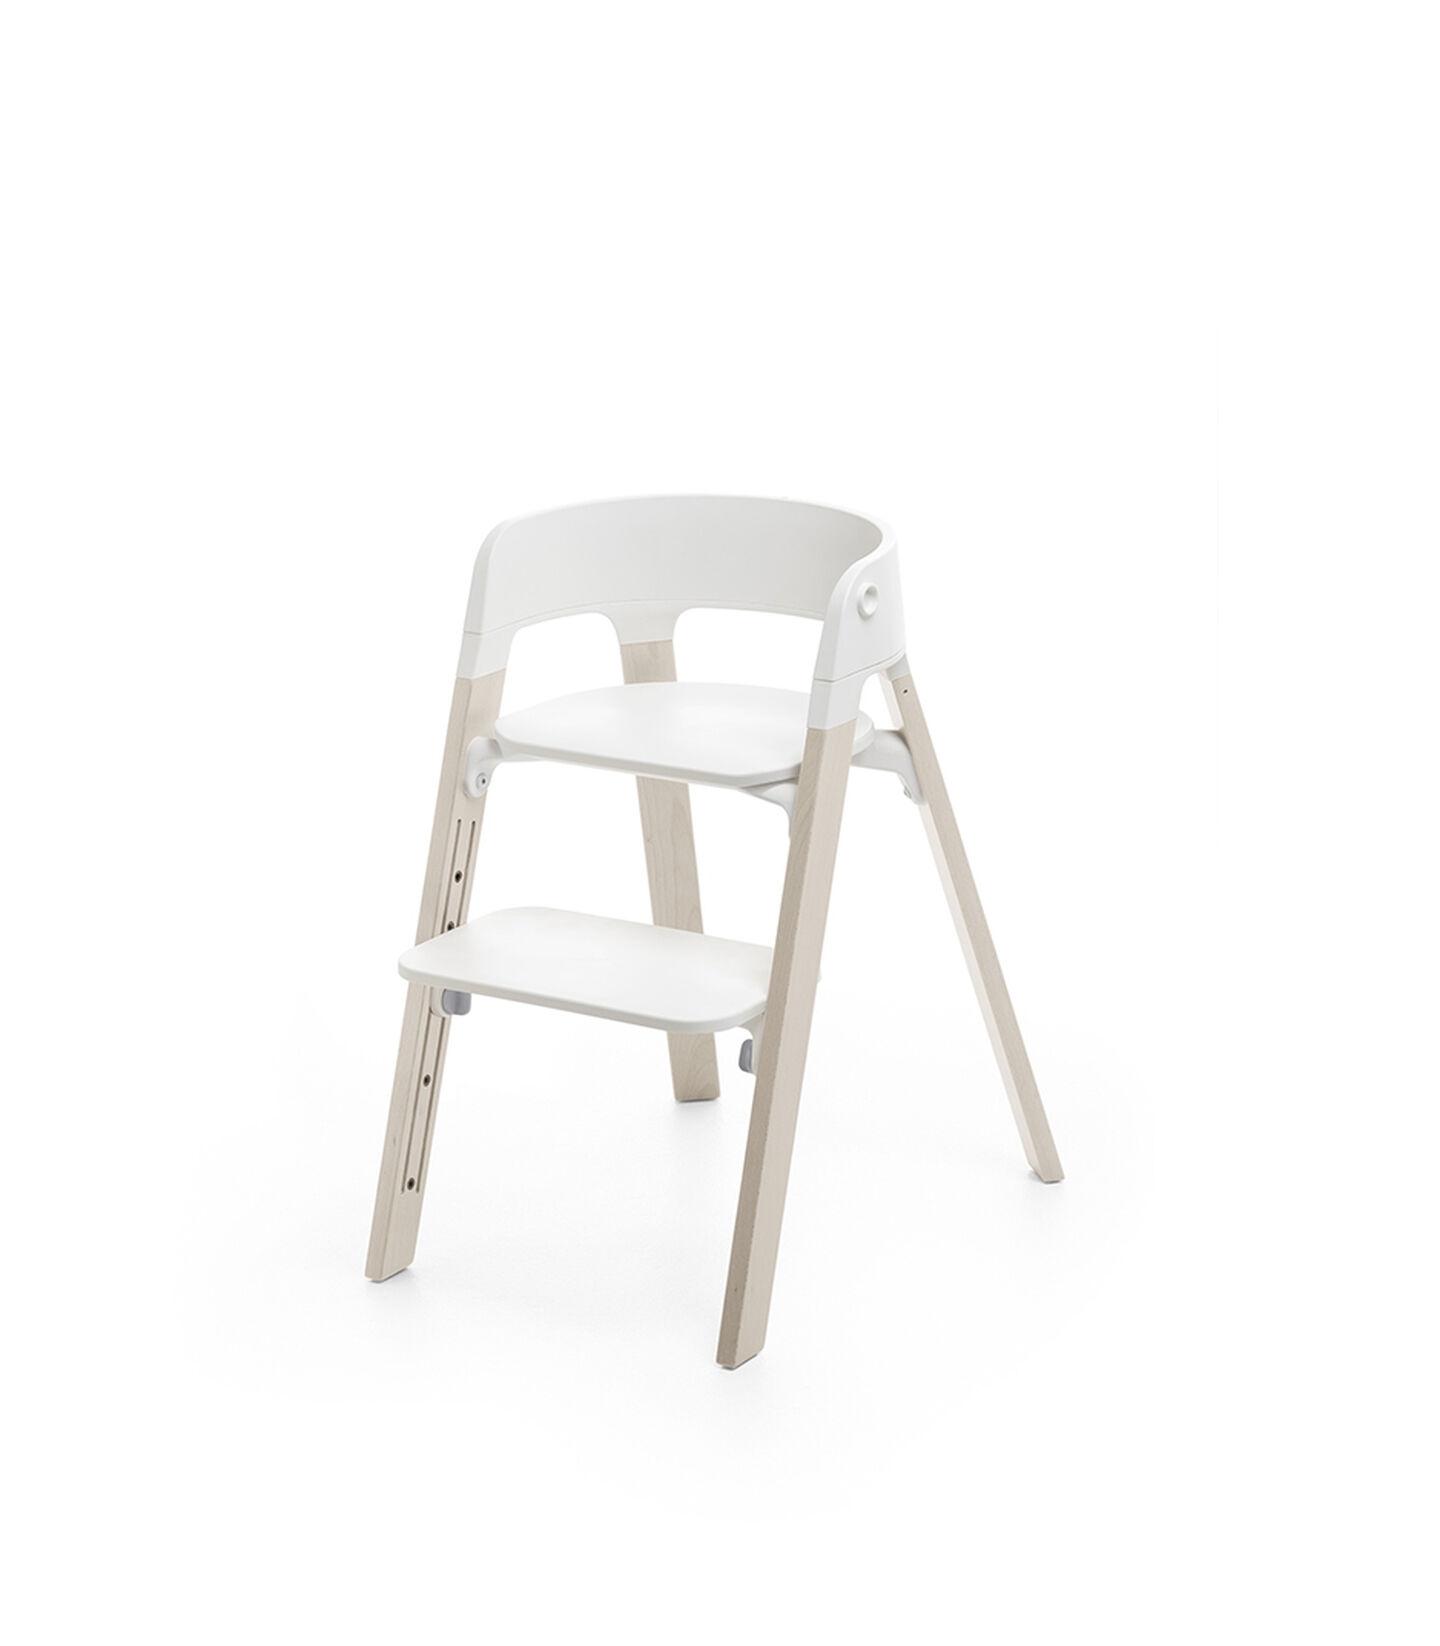 Stokke® Steps™ Chair White Seat Whitewash Legs, Whitewash, mainview view 2